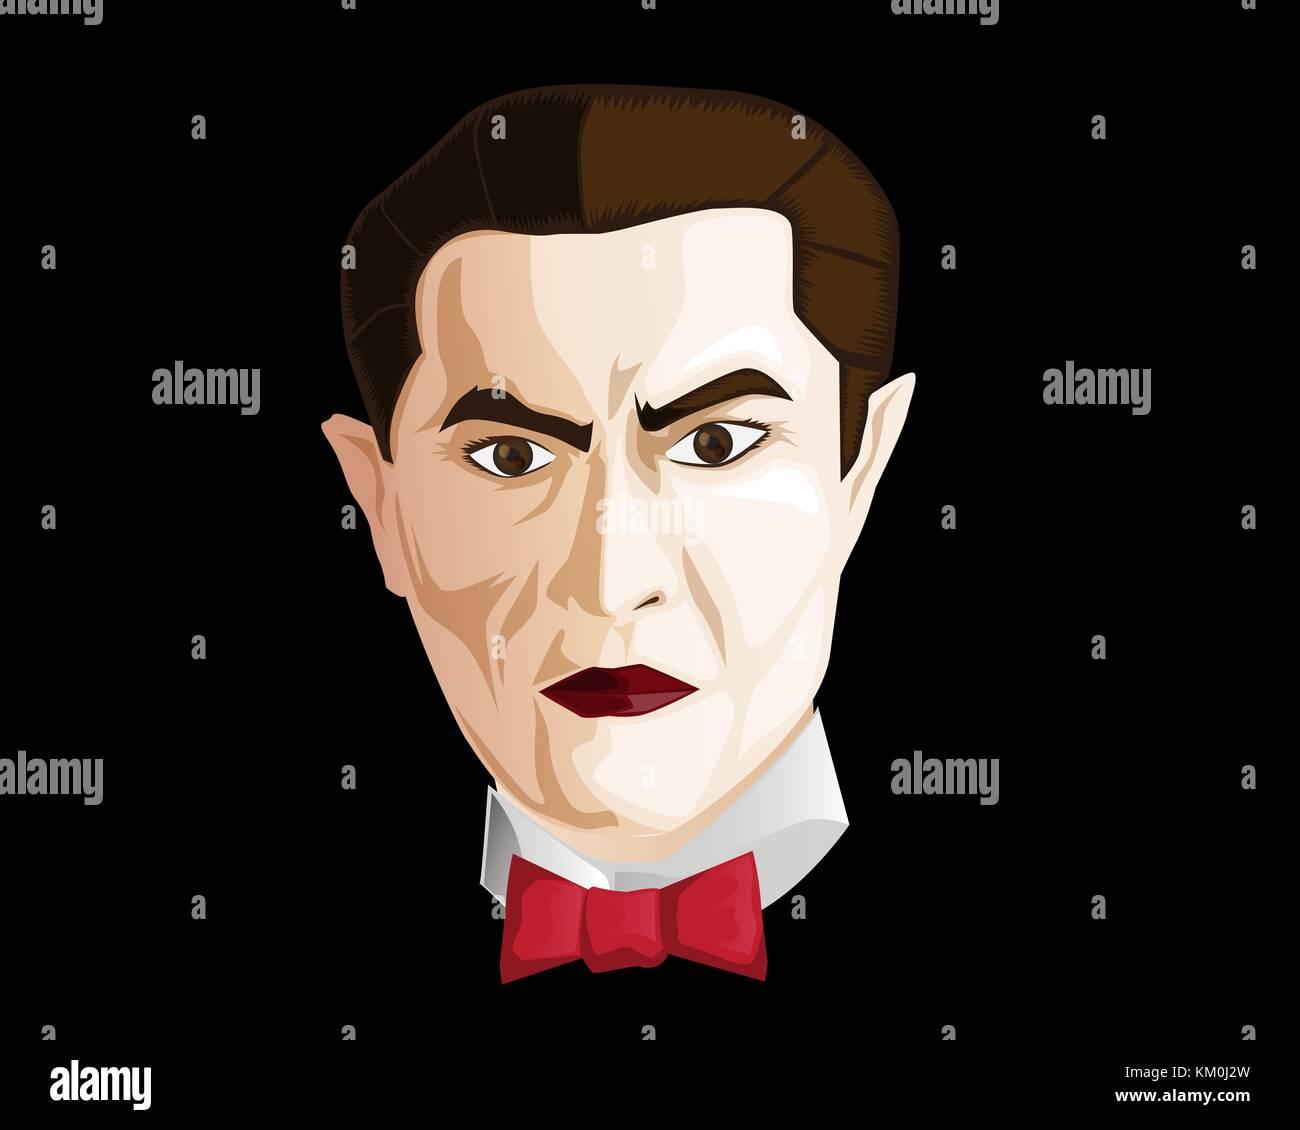 vampire clip art - Stock Image